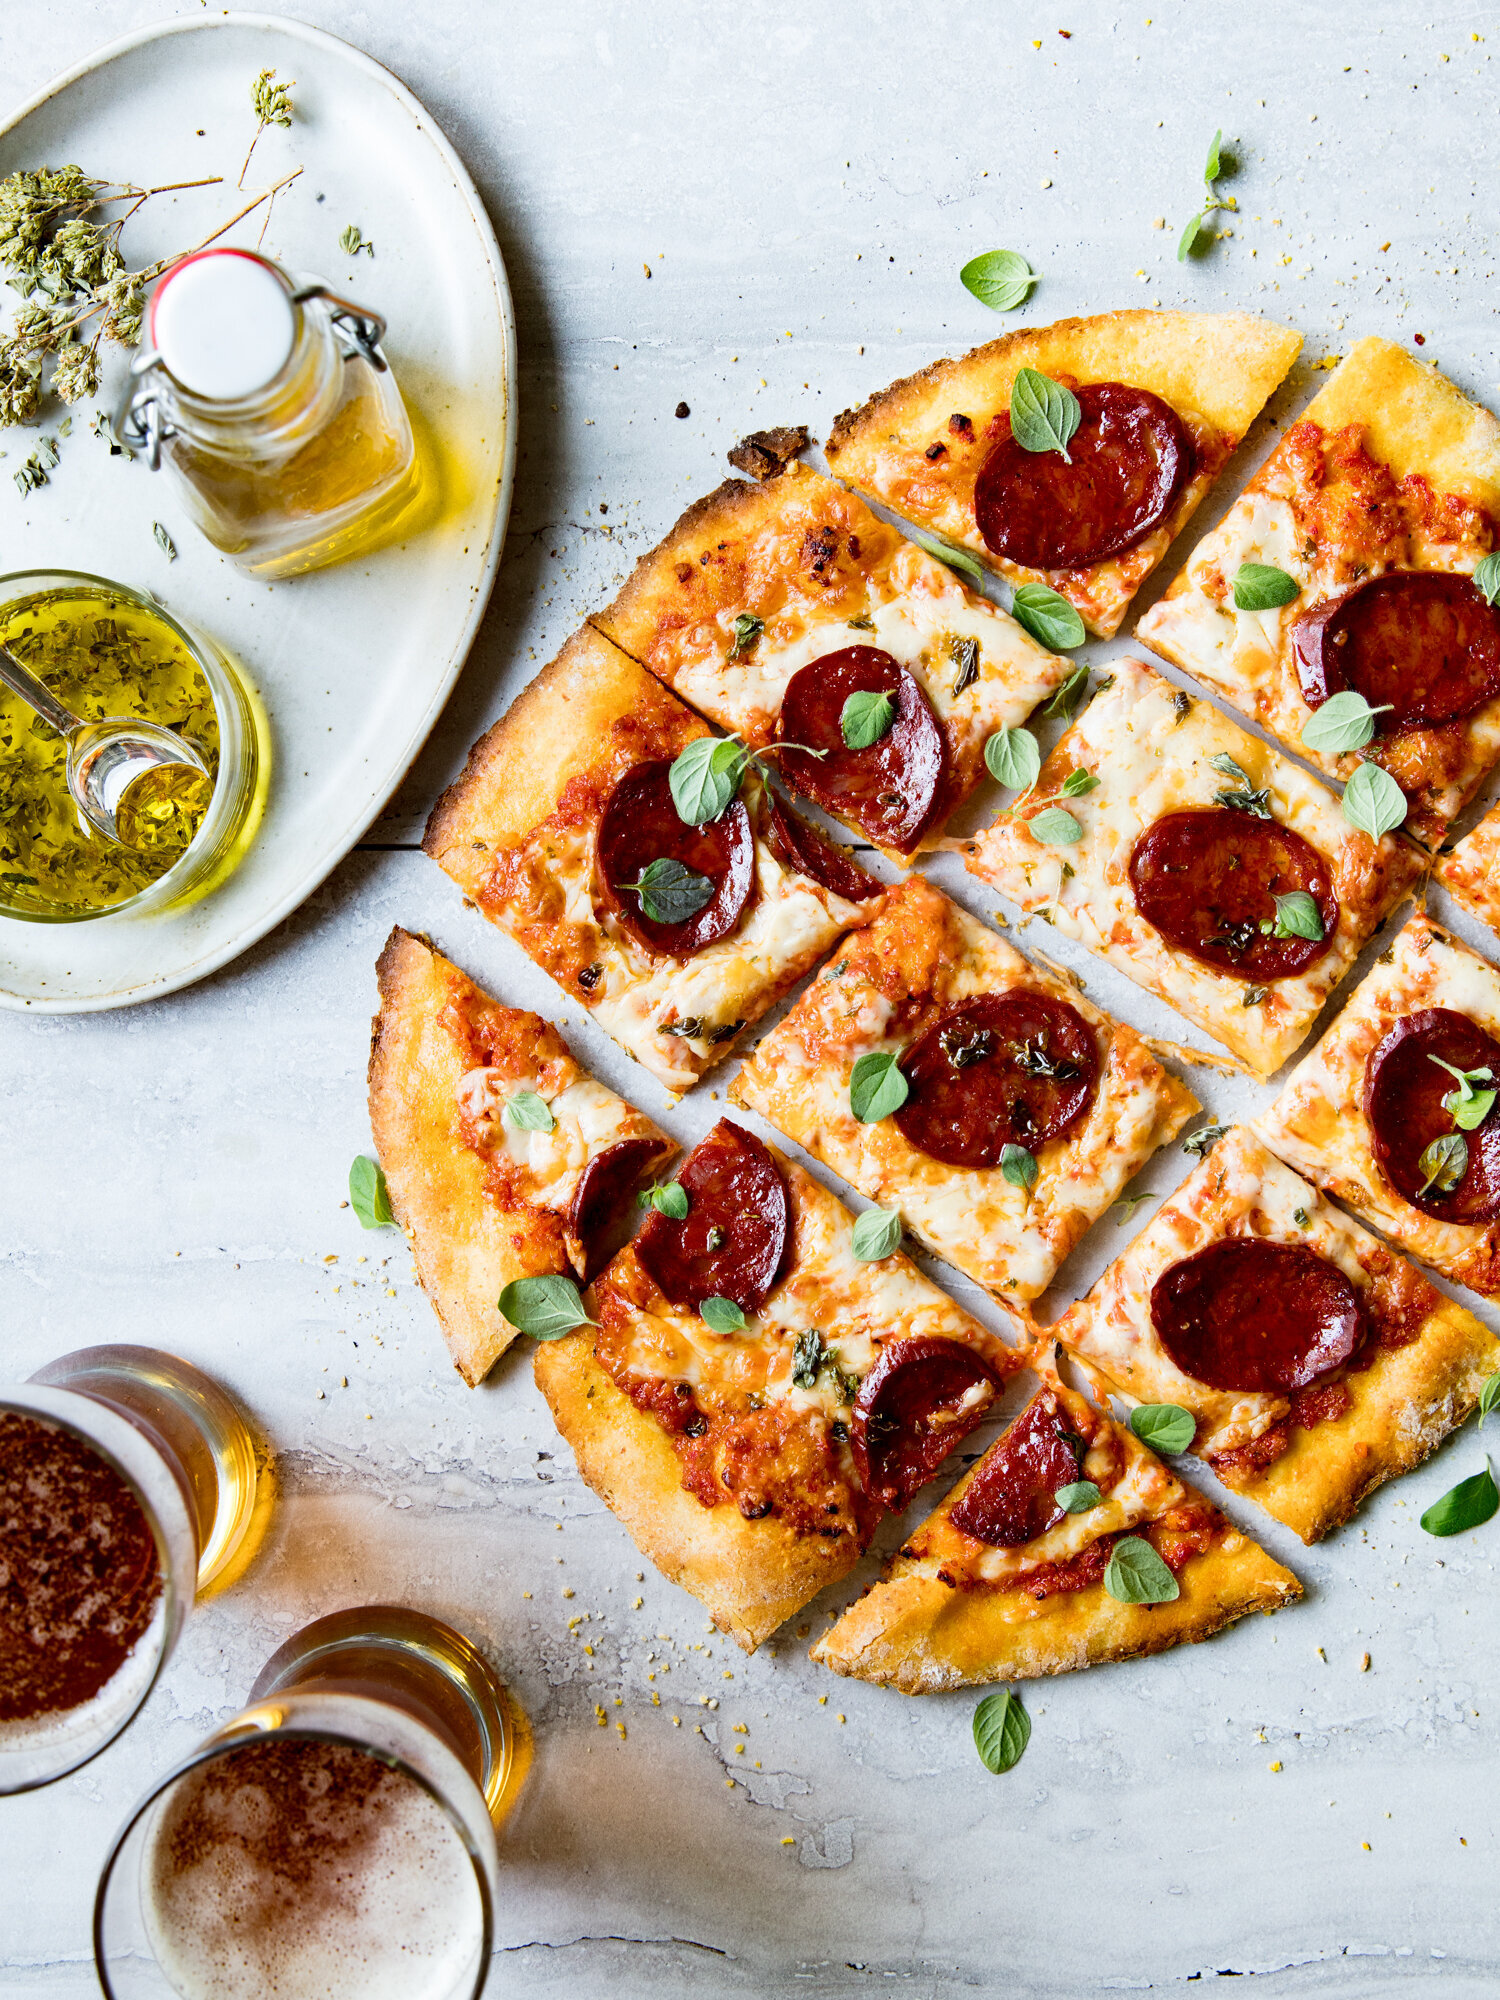 erin-scott-san-francisco-california-studio-food-photographer_Williams-Sonoma_TestKitchen_Pizza-cookbook-4.jpg